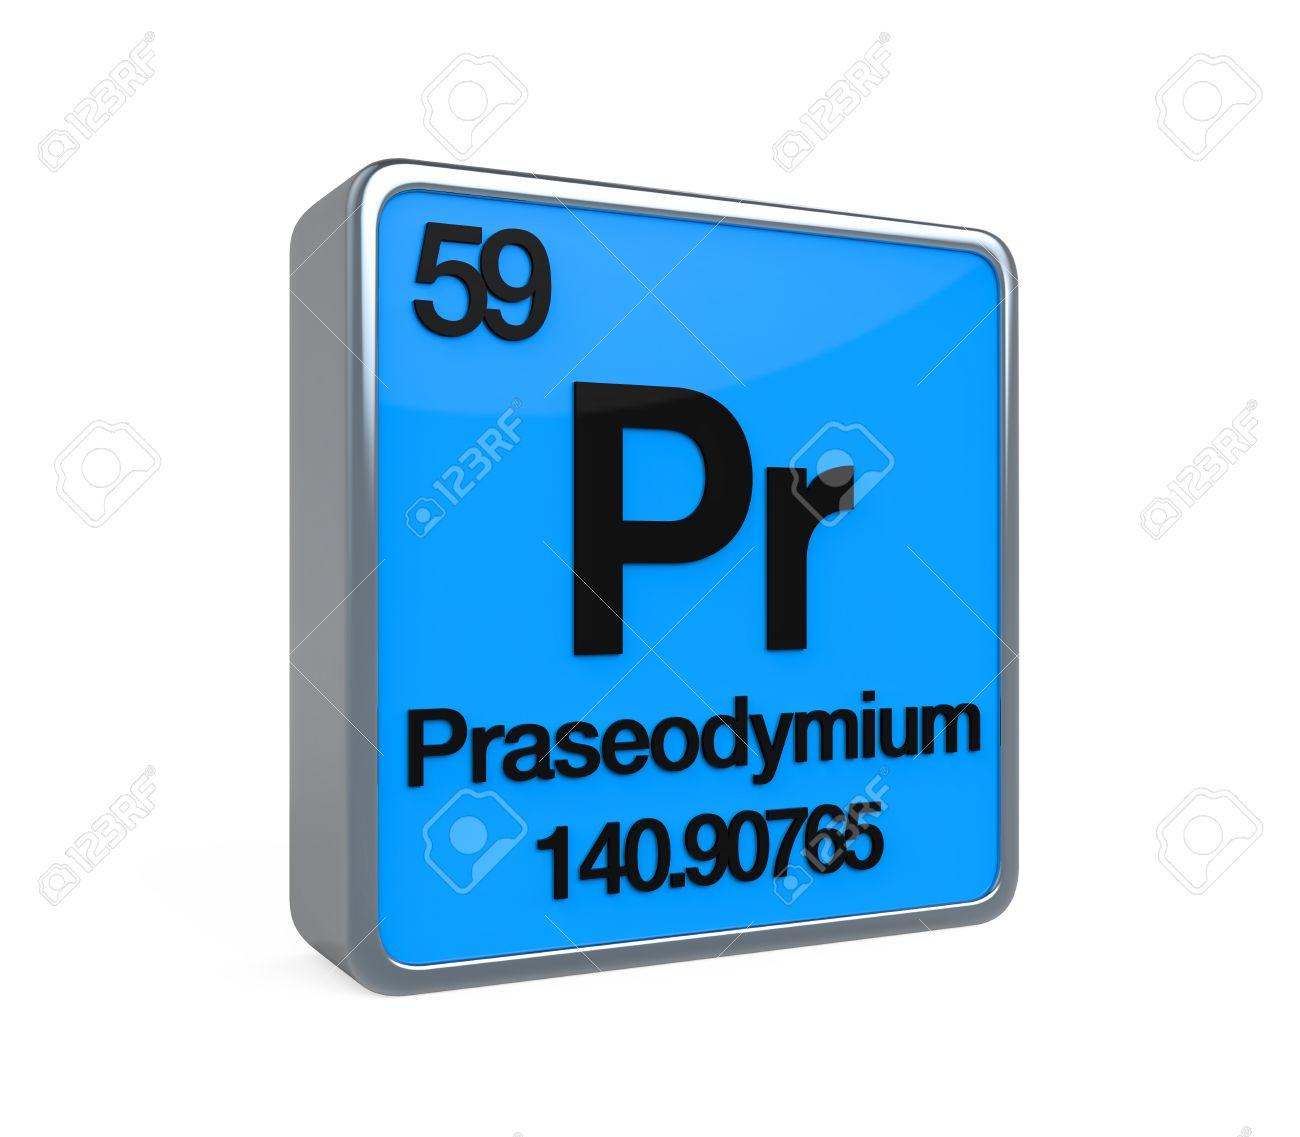 Praseodymium element periodic table stock photo picture and praseodymium element periodic table stock photo 32904212 gamestrikefo Image collections